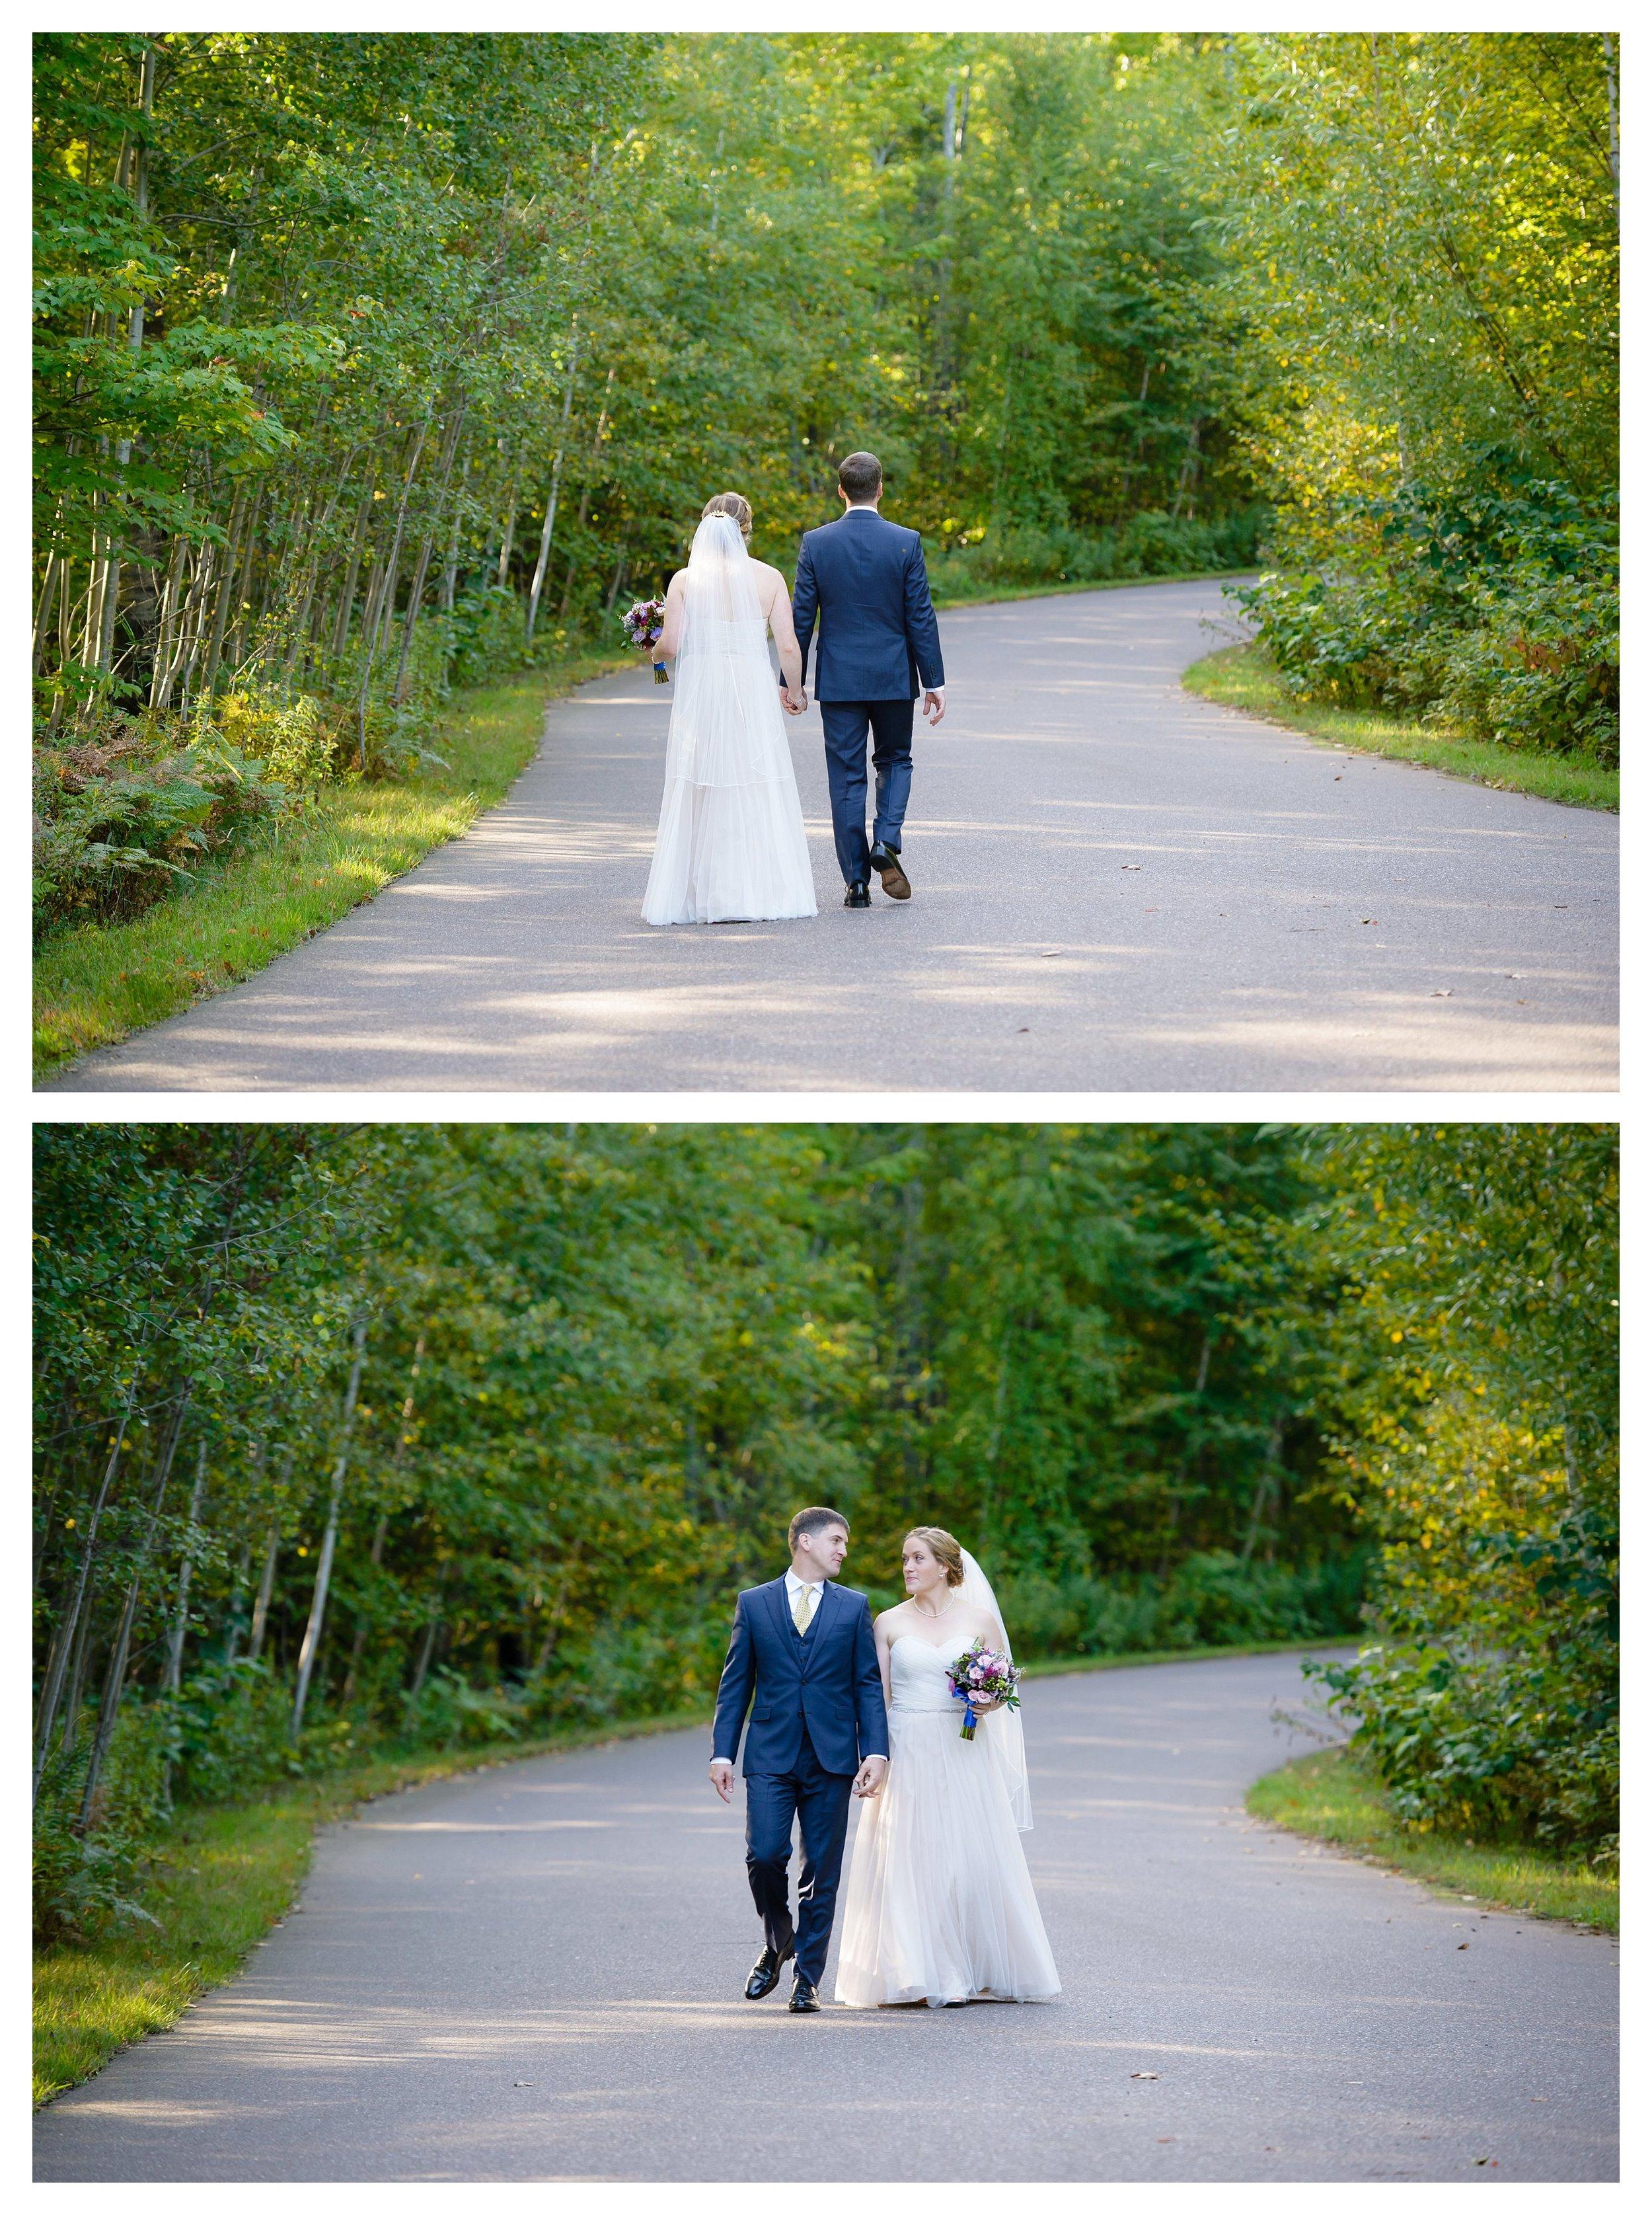 Lindstrom MN Twin cities Minnesota northwoods Bayfield wisconsin destination wedding ps 139 photography_0472.jpg